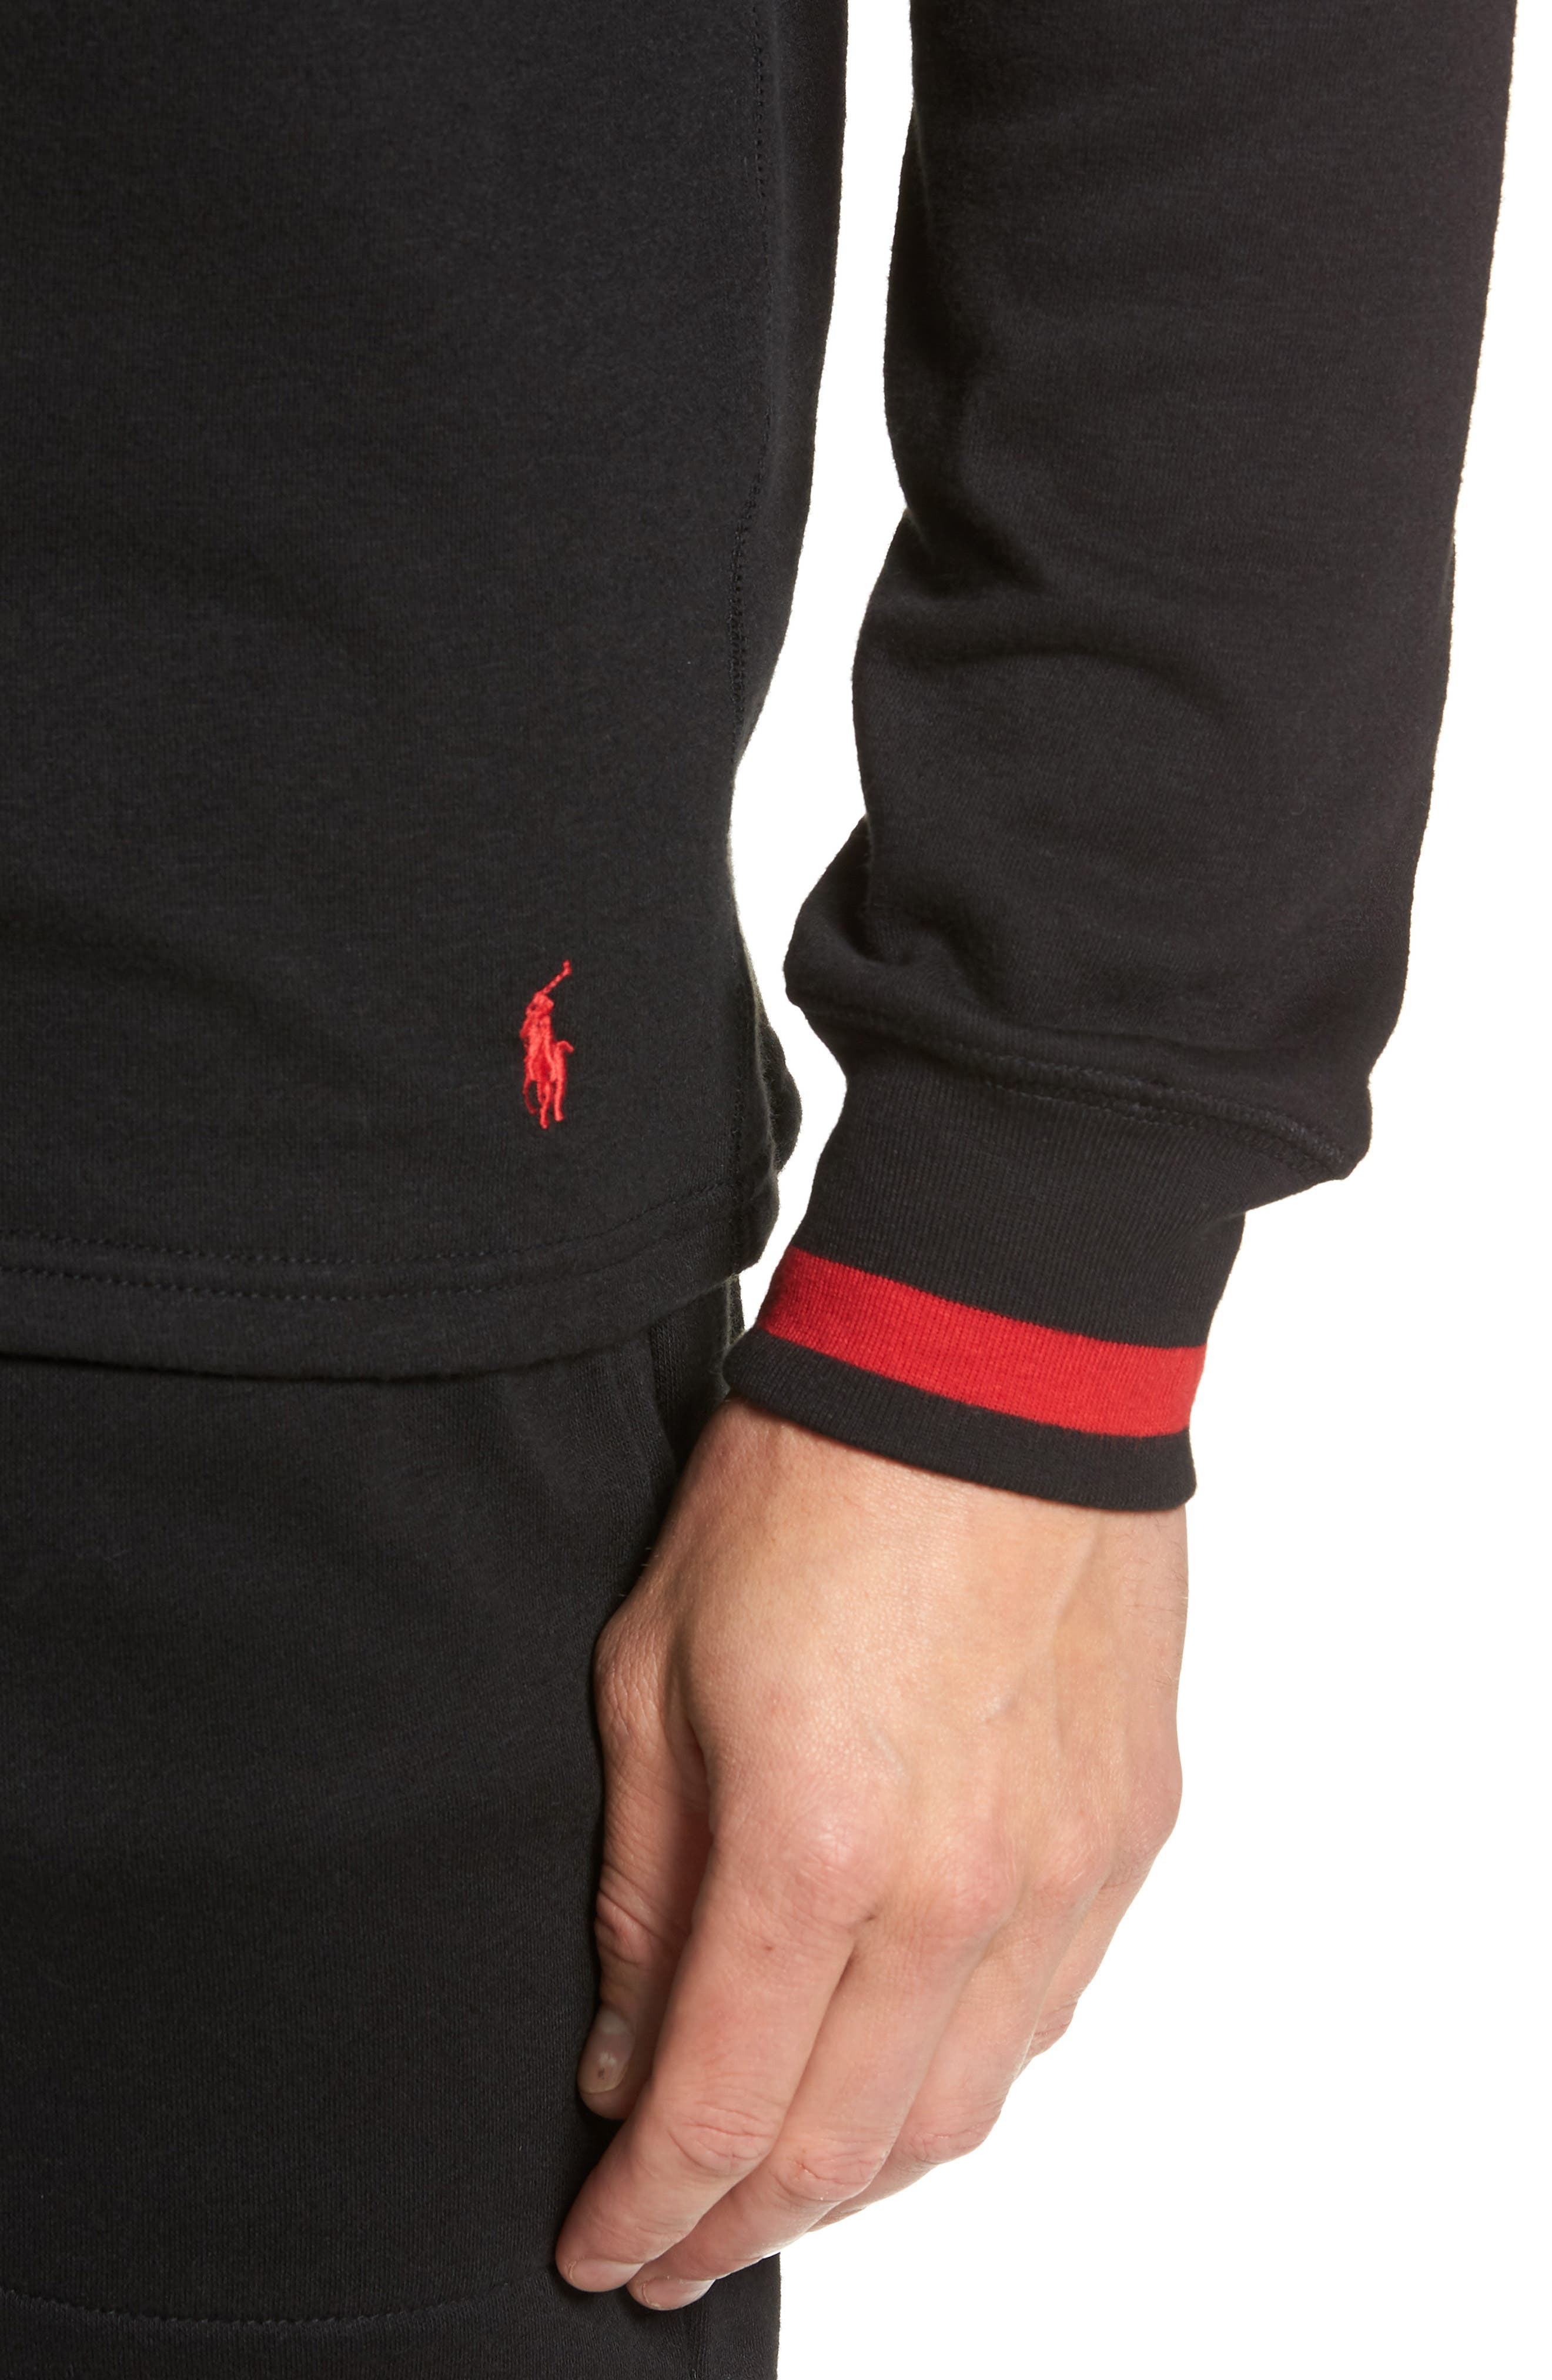 POLO RALPH LAUREN,                             Brushed Jersey Cotton Blend Crewneck Sweatshirt,                             Alternate thumbnail 4, color,                             POLO BLACK